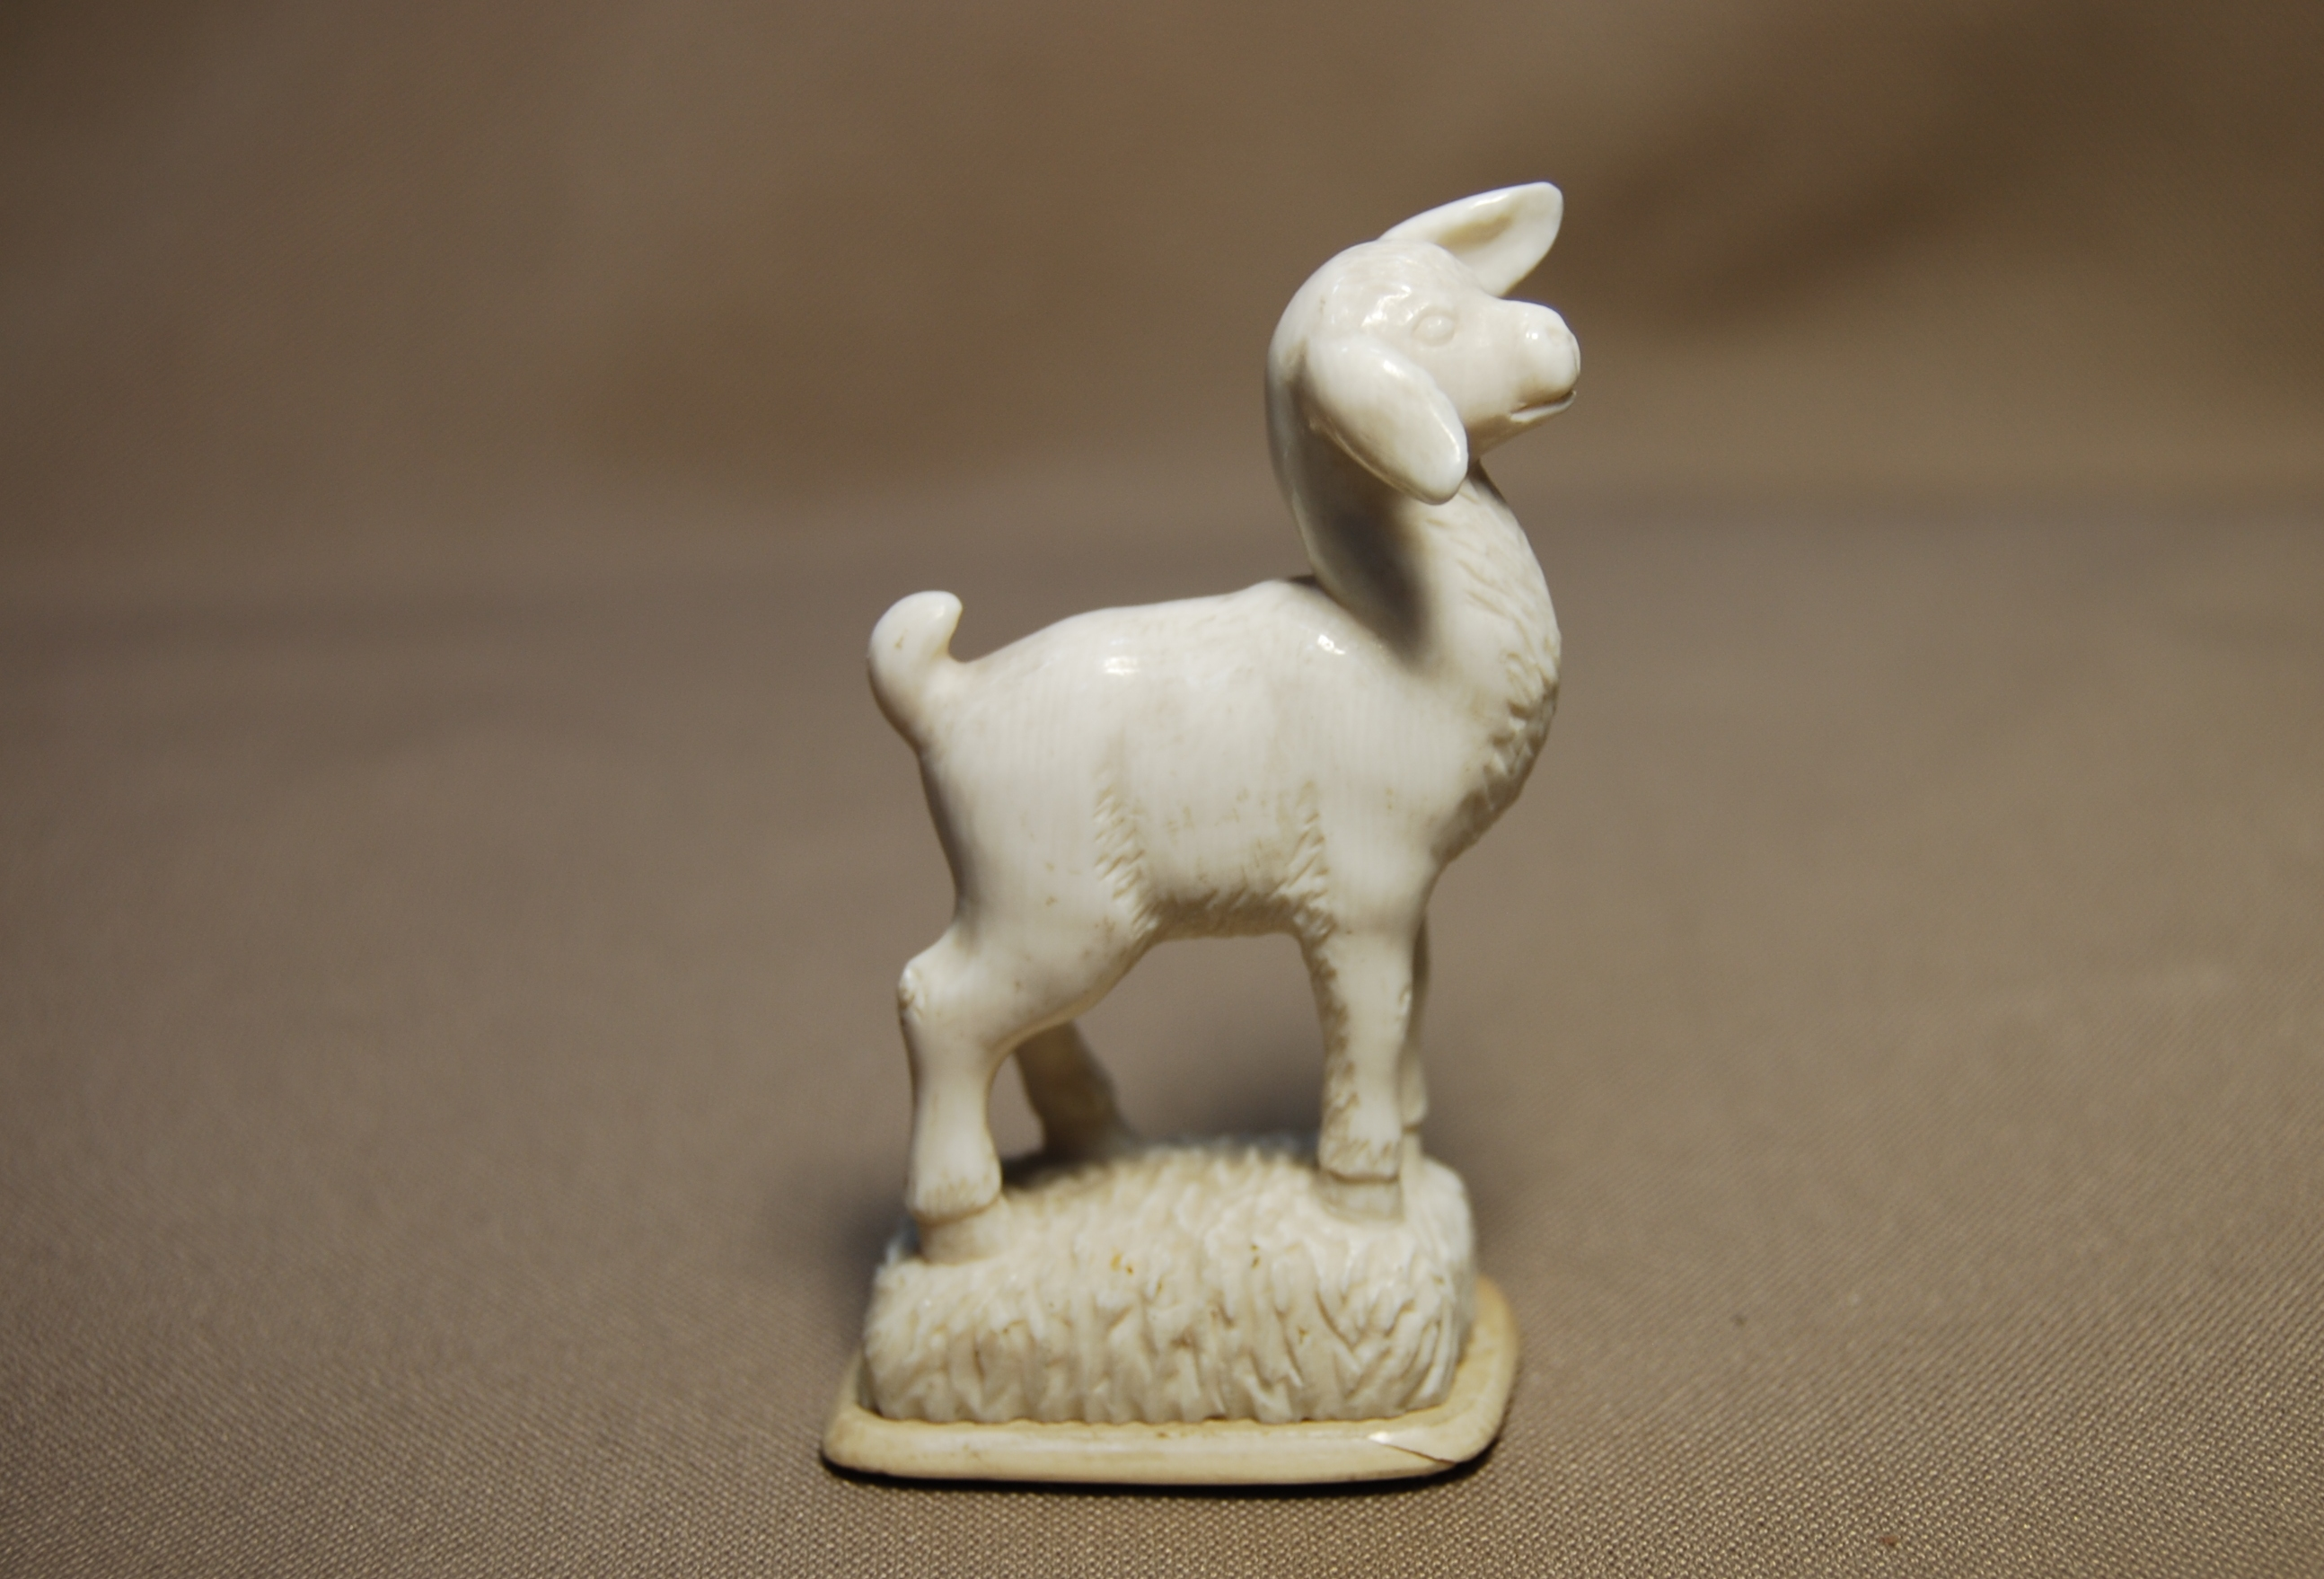 Скульптура         Барашек,           Материал                 рог лося.jpg